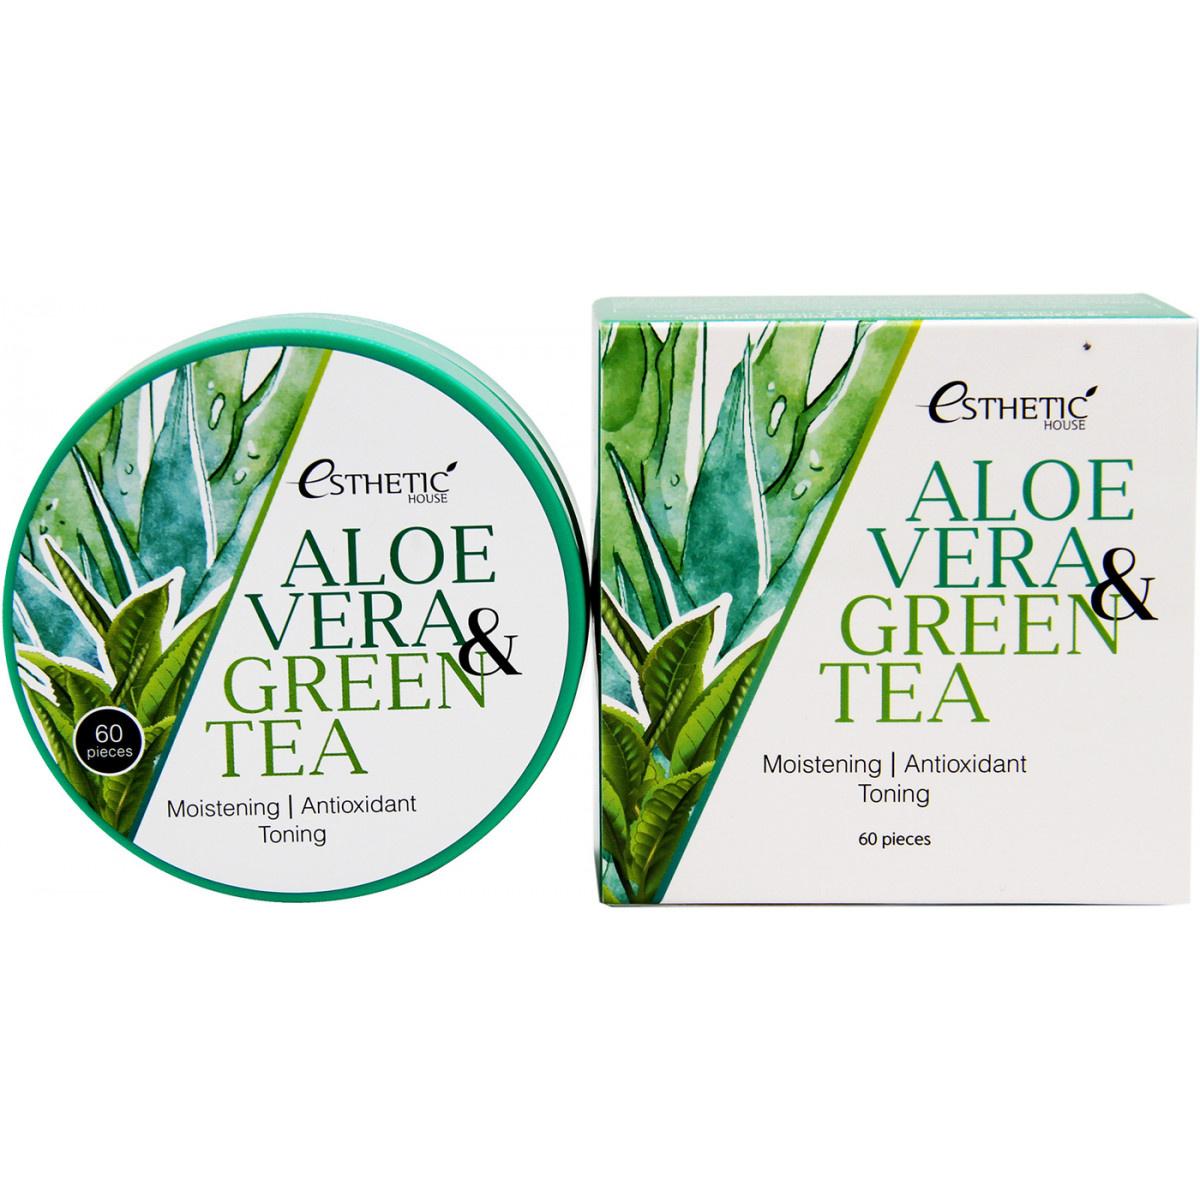 Гидрогелевые патчи Esthetic House Aloe Vera & Green Tea Hydrogel Eye Patch 60 шт фото